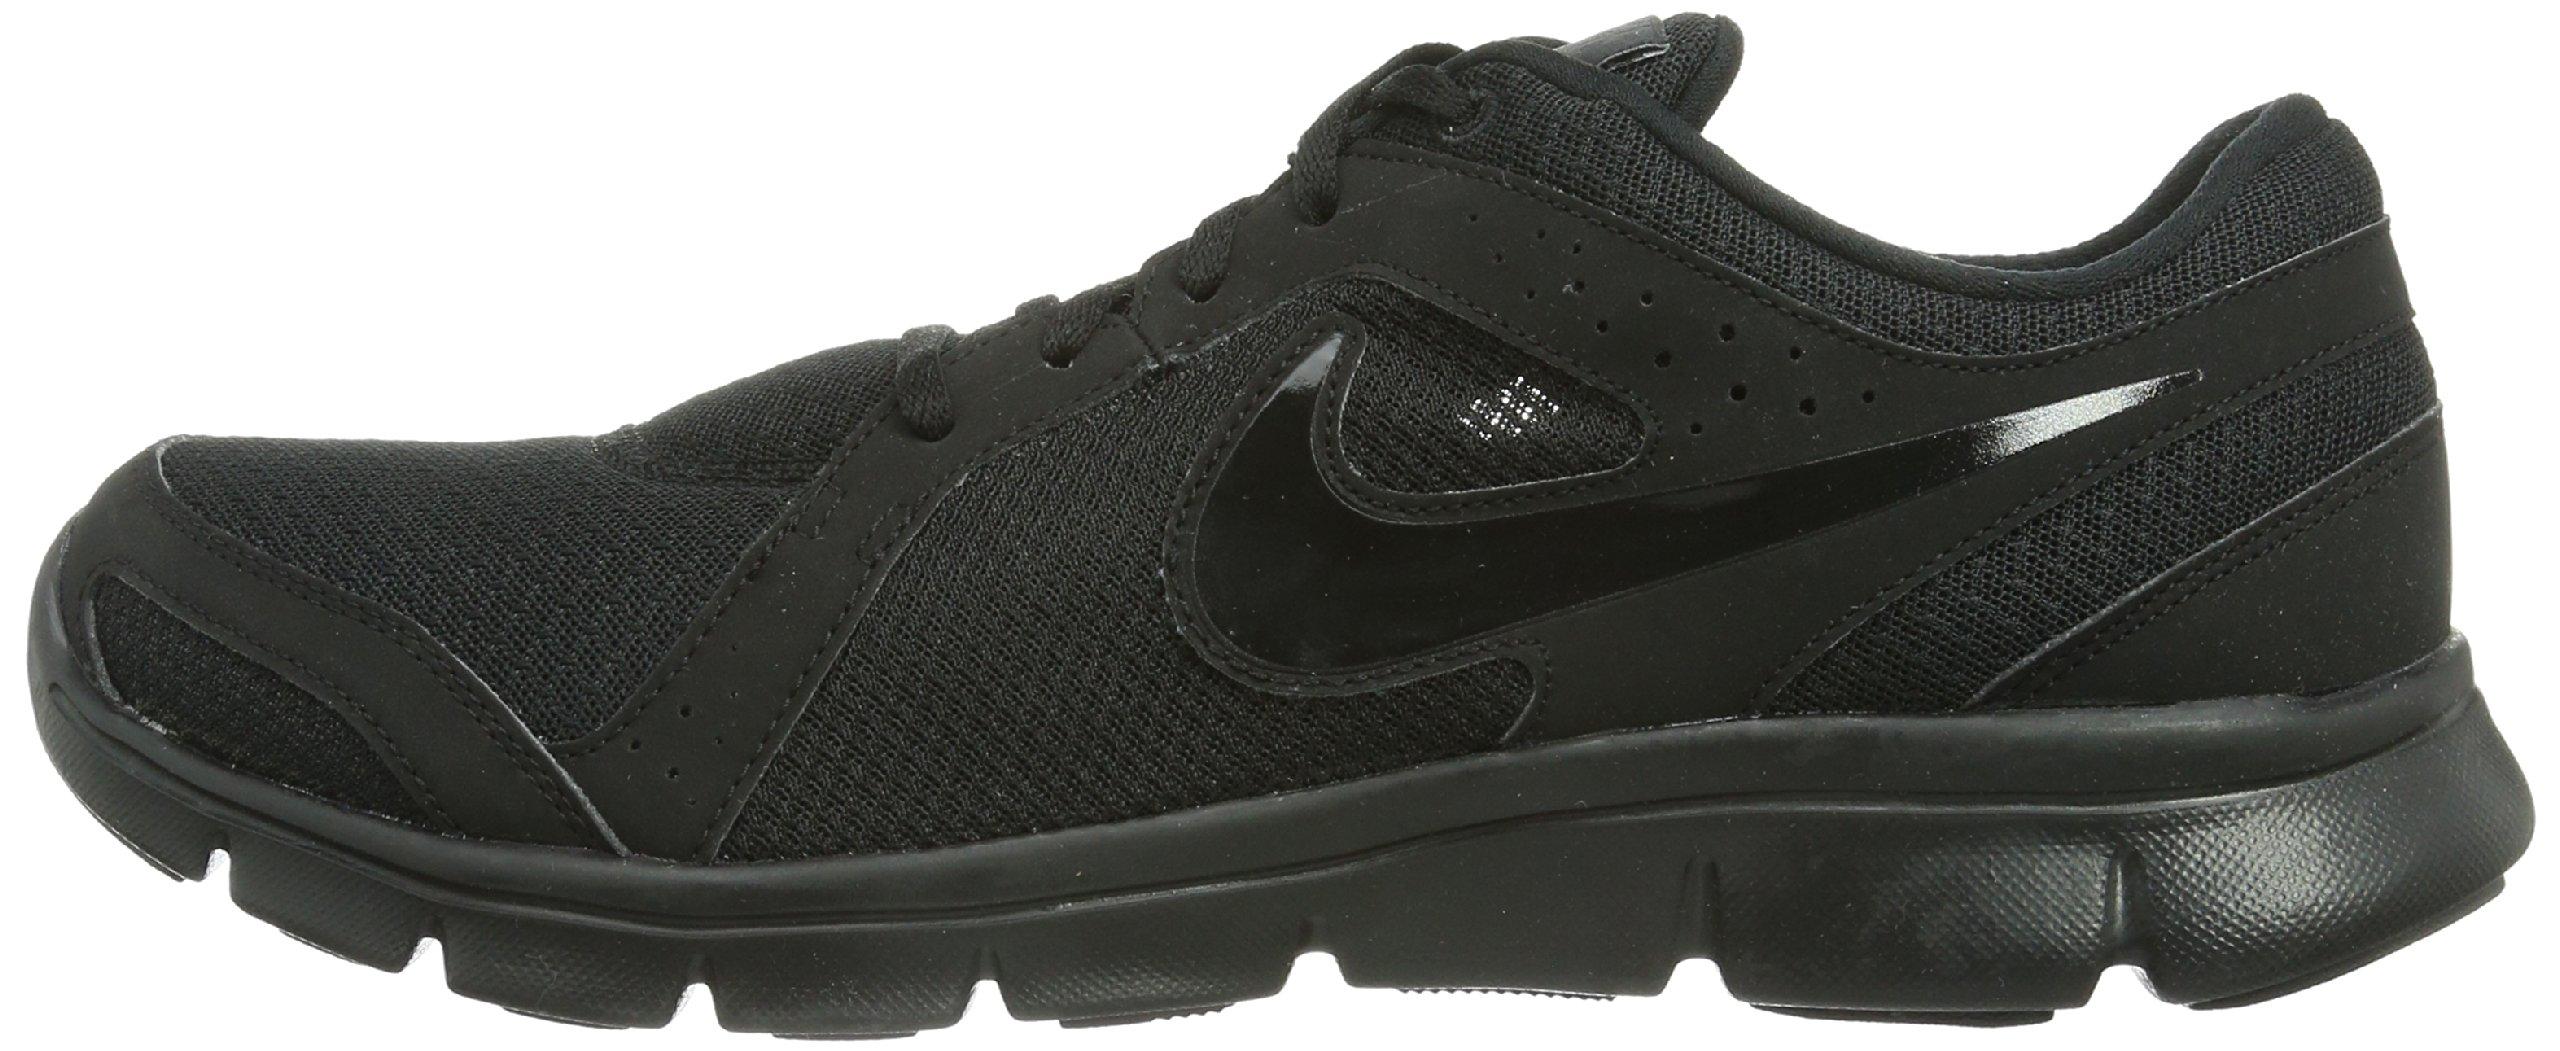 812viIH9NaL - Nike Women's sneakers